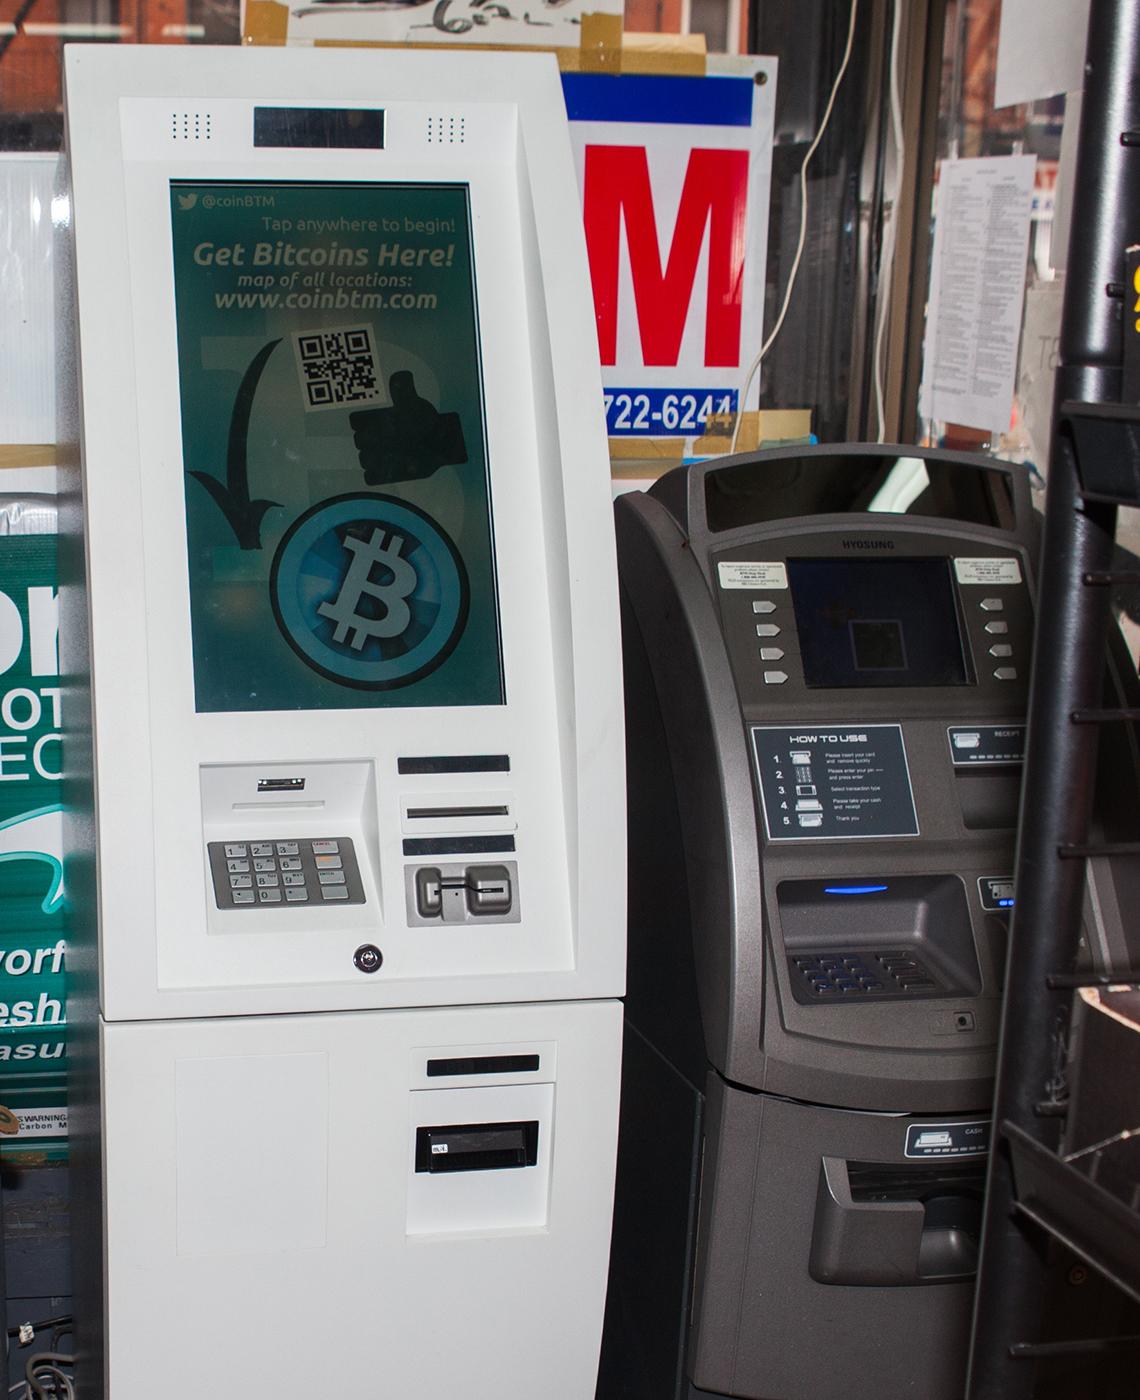 a bitcoin a t m machine in a grocery store